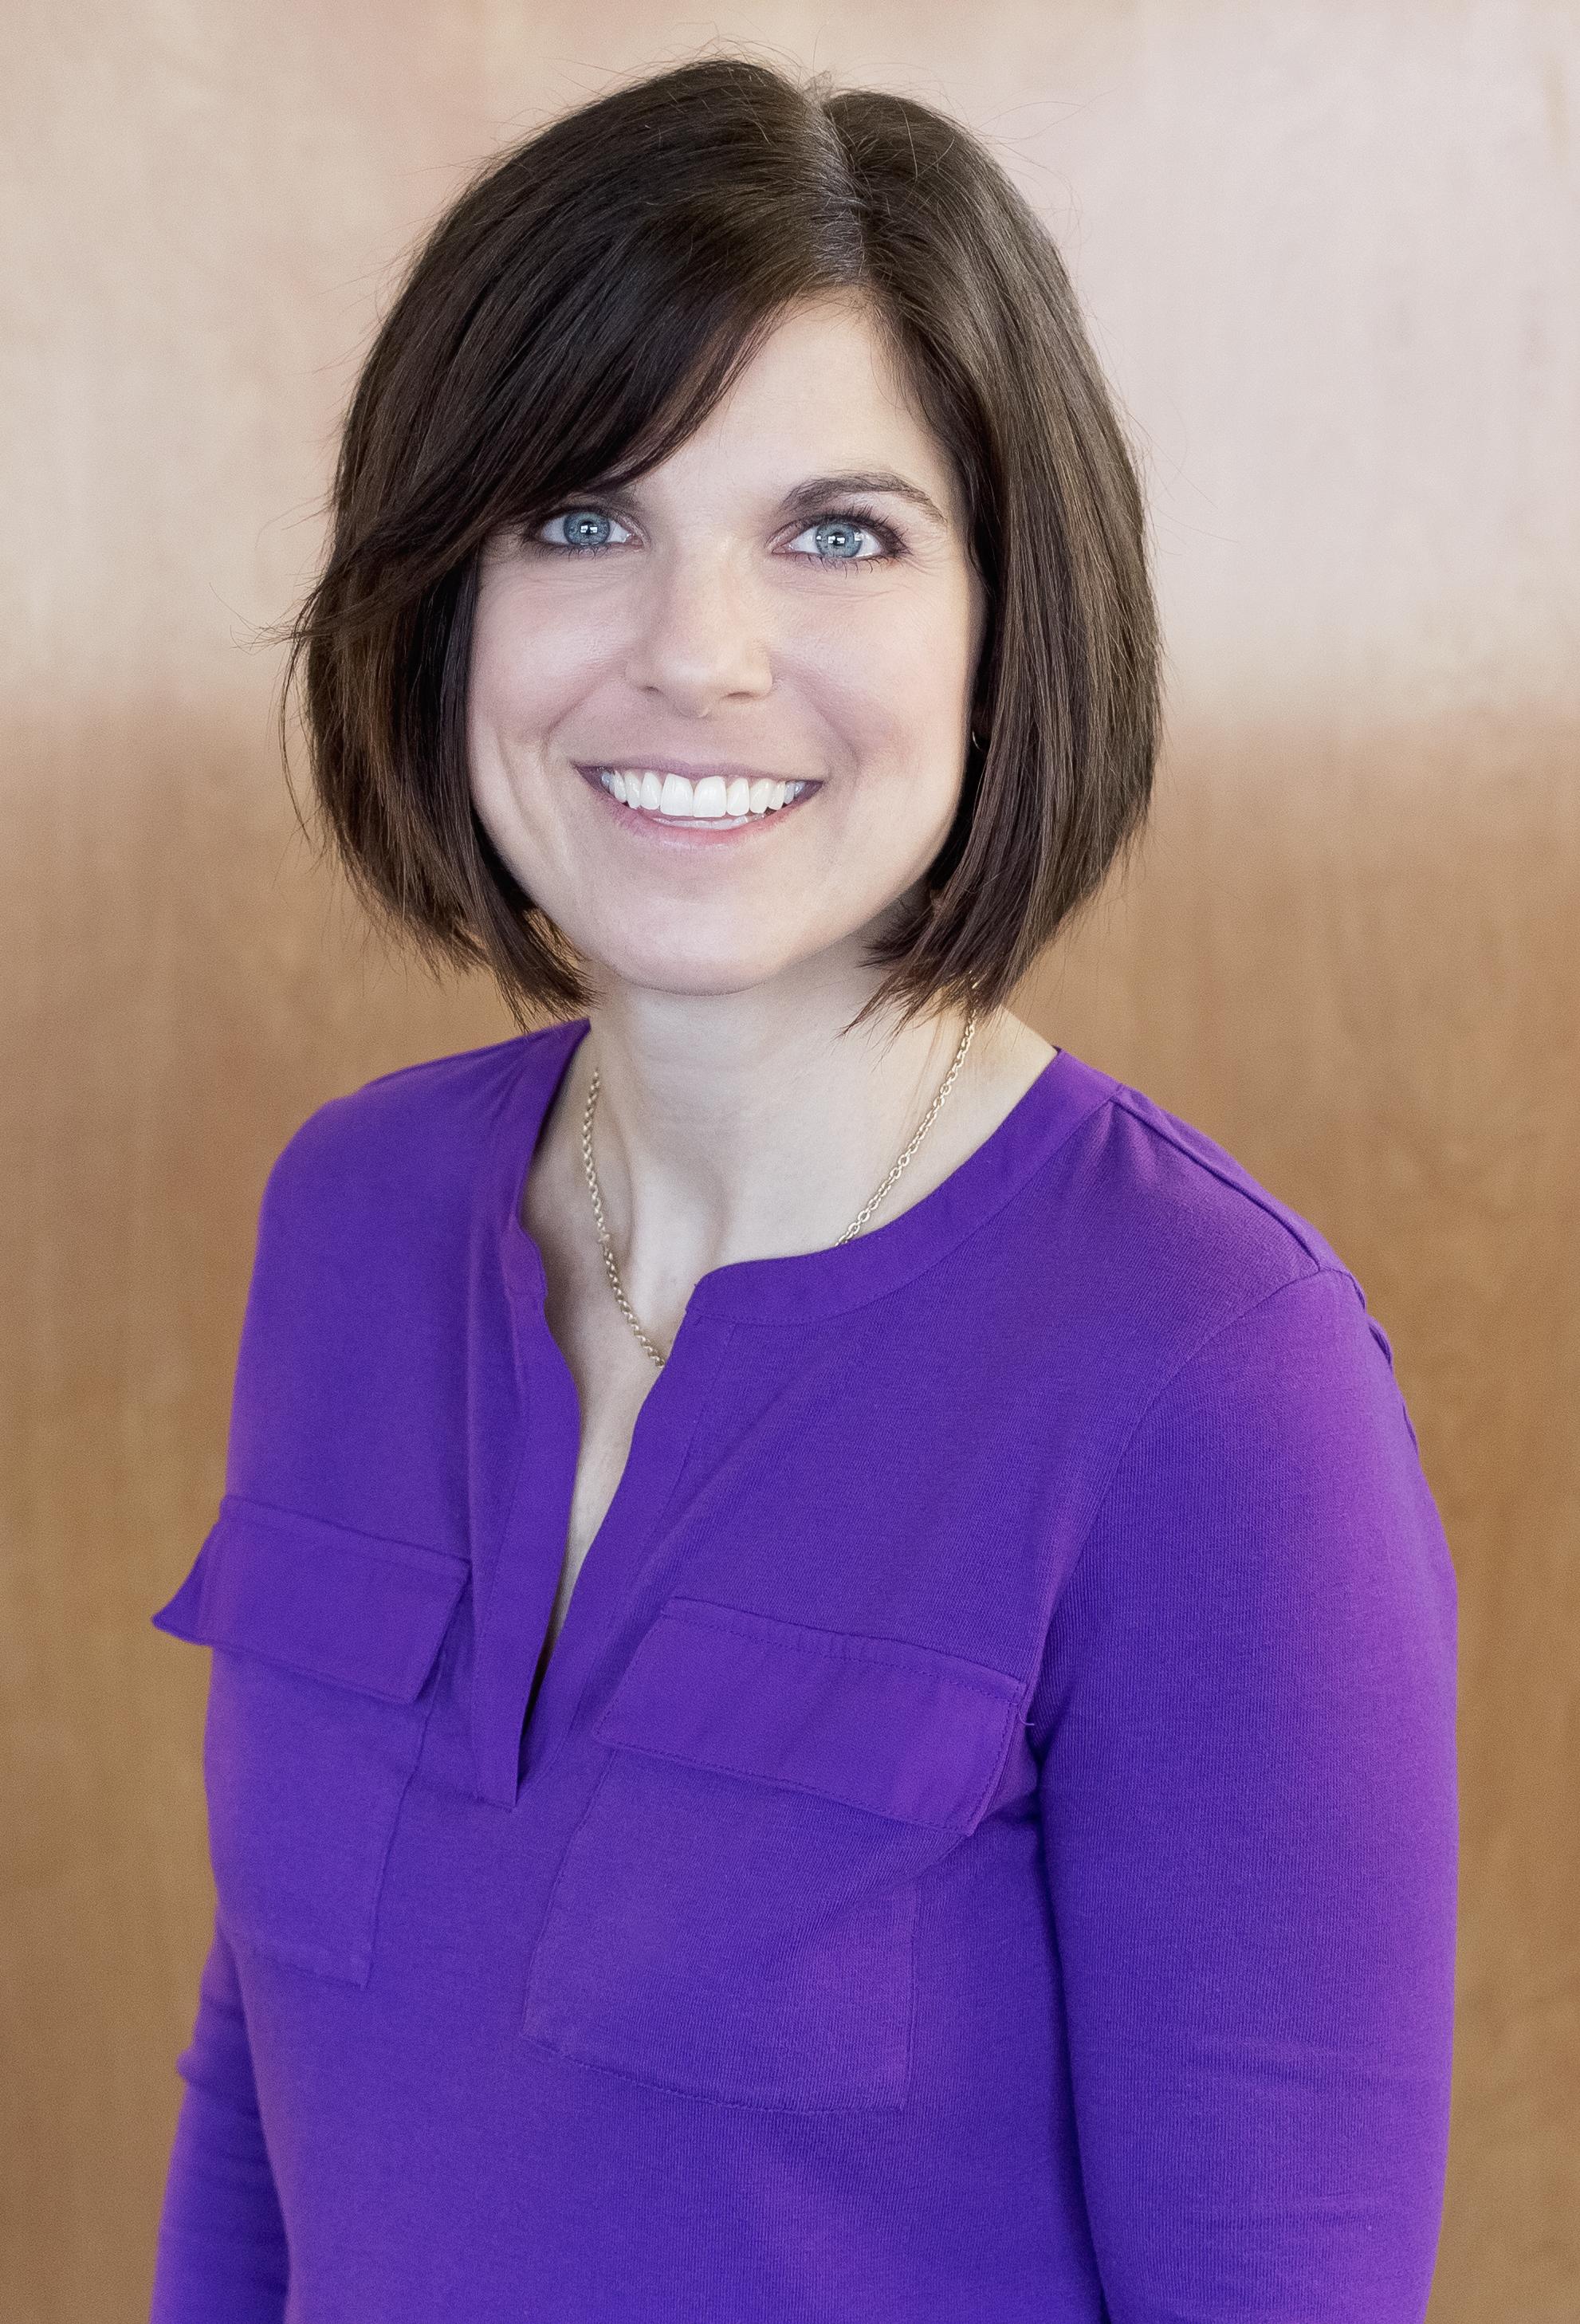 Debbie McKiernan - Office Manager - Kuno Creative